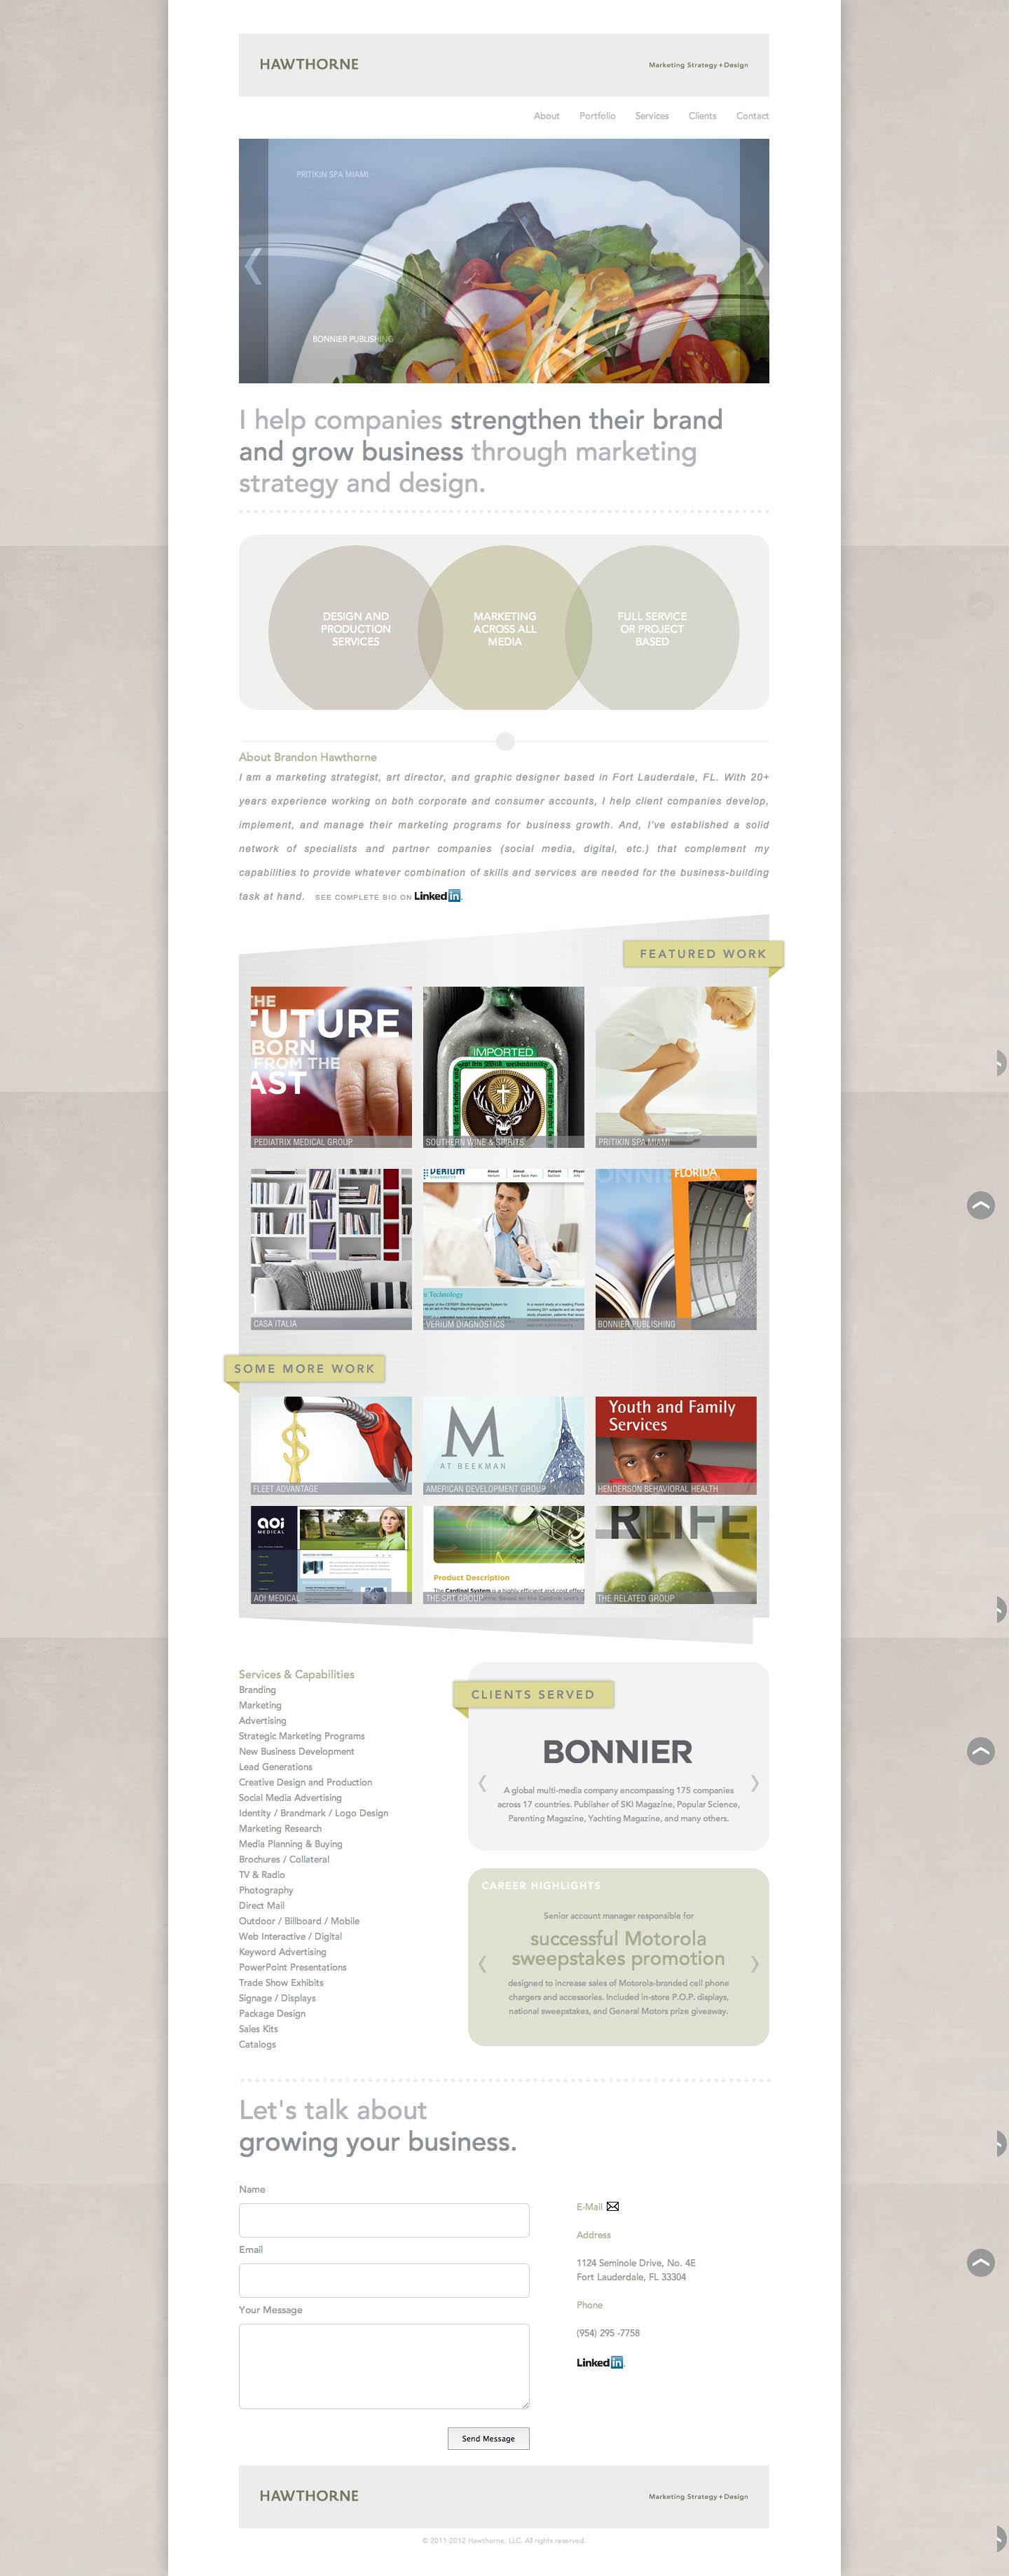 Hawthorne LLC Website Screenshot